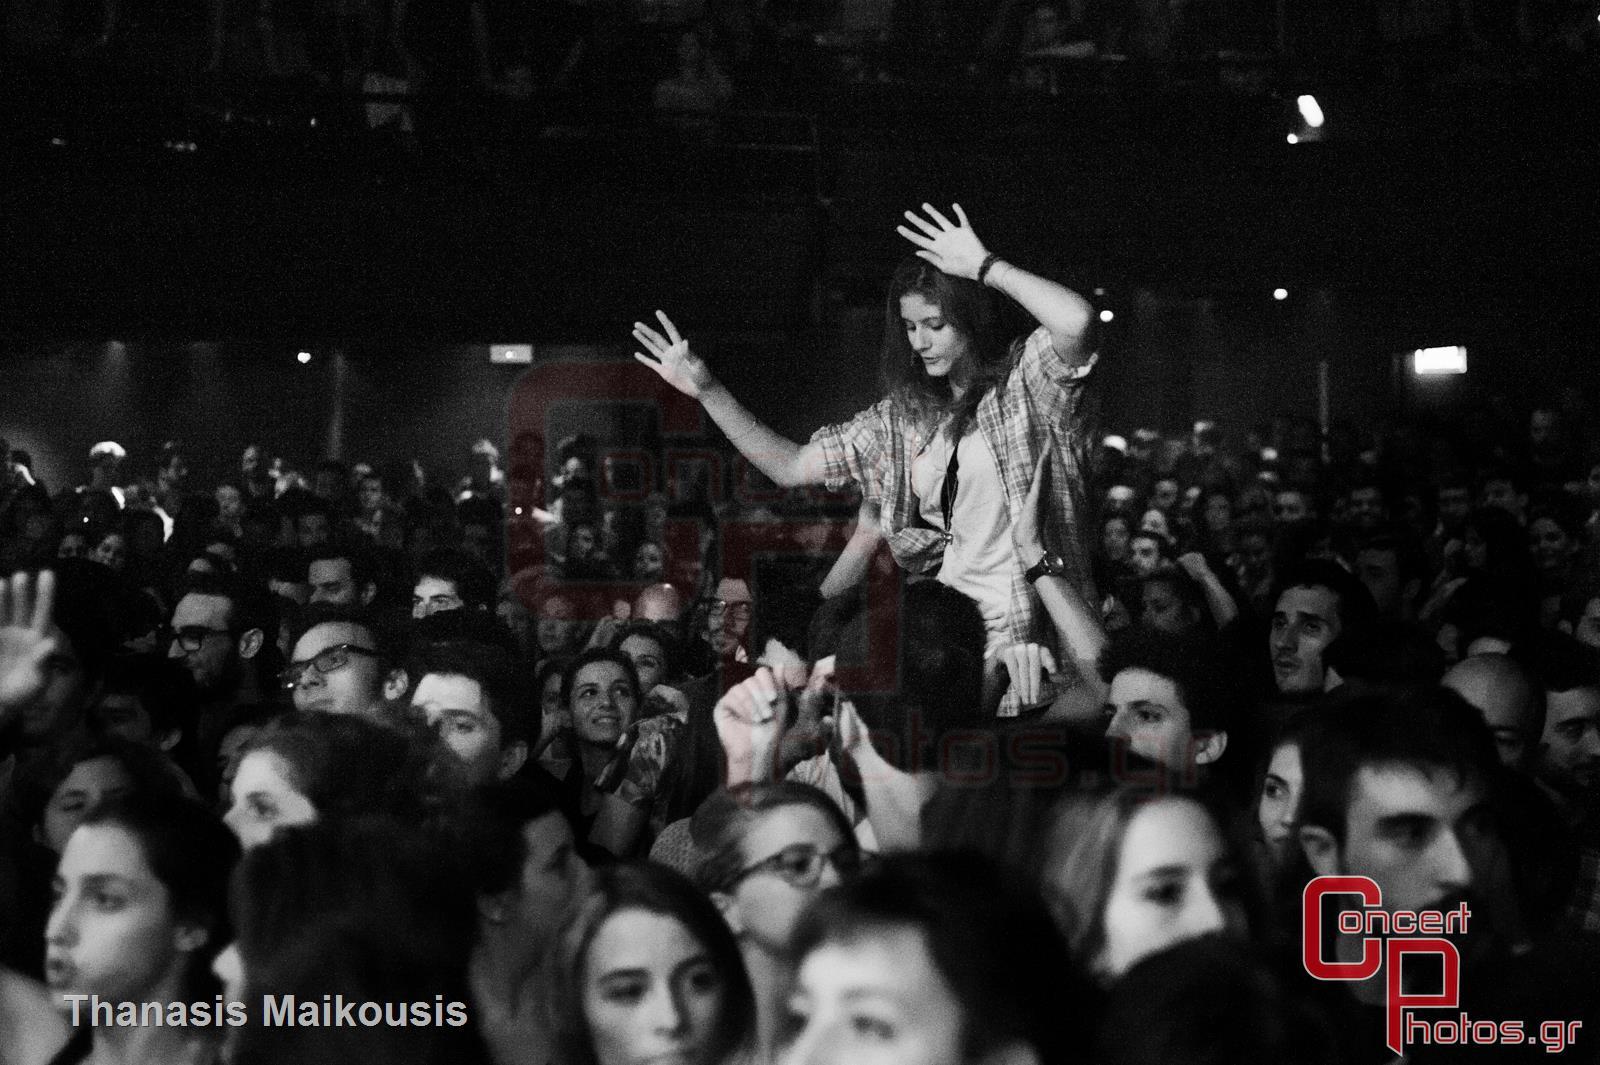 Gramatik-Gramatik Votanikos 2013 photographer: Thanasis Maikousis - ConcertPhotos-6000